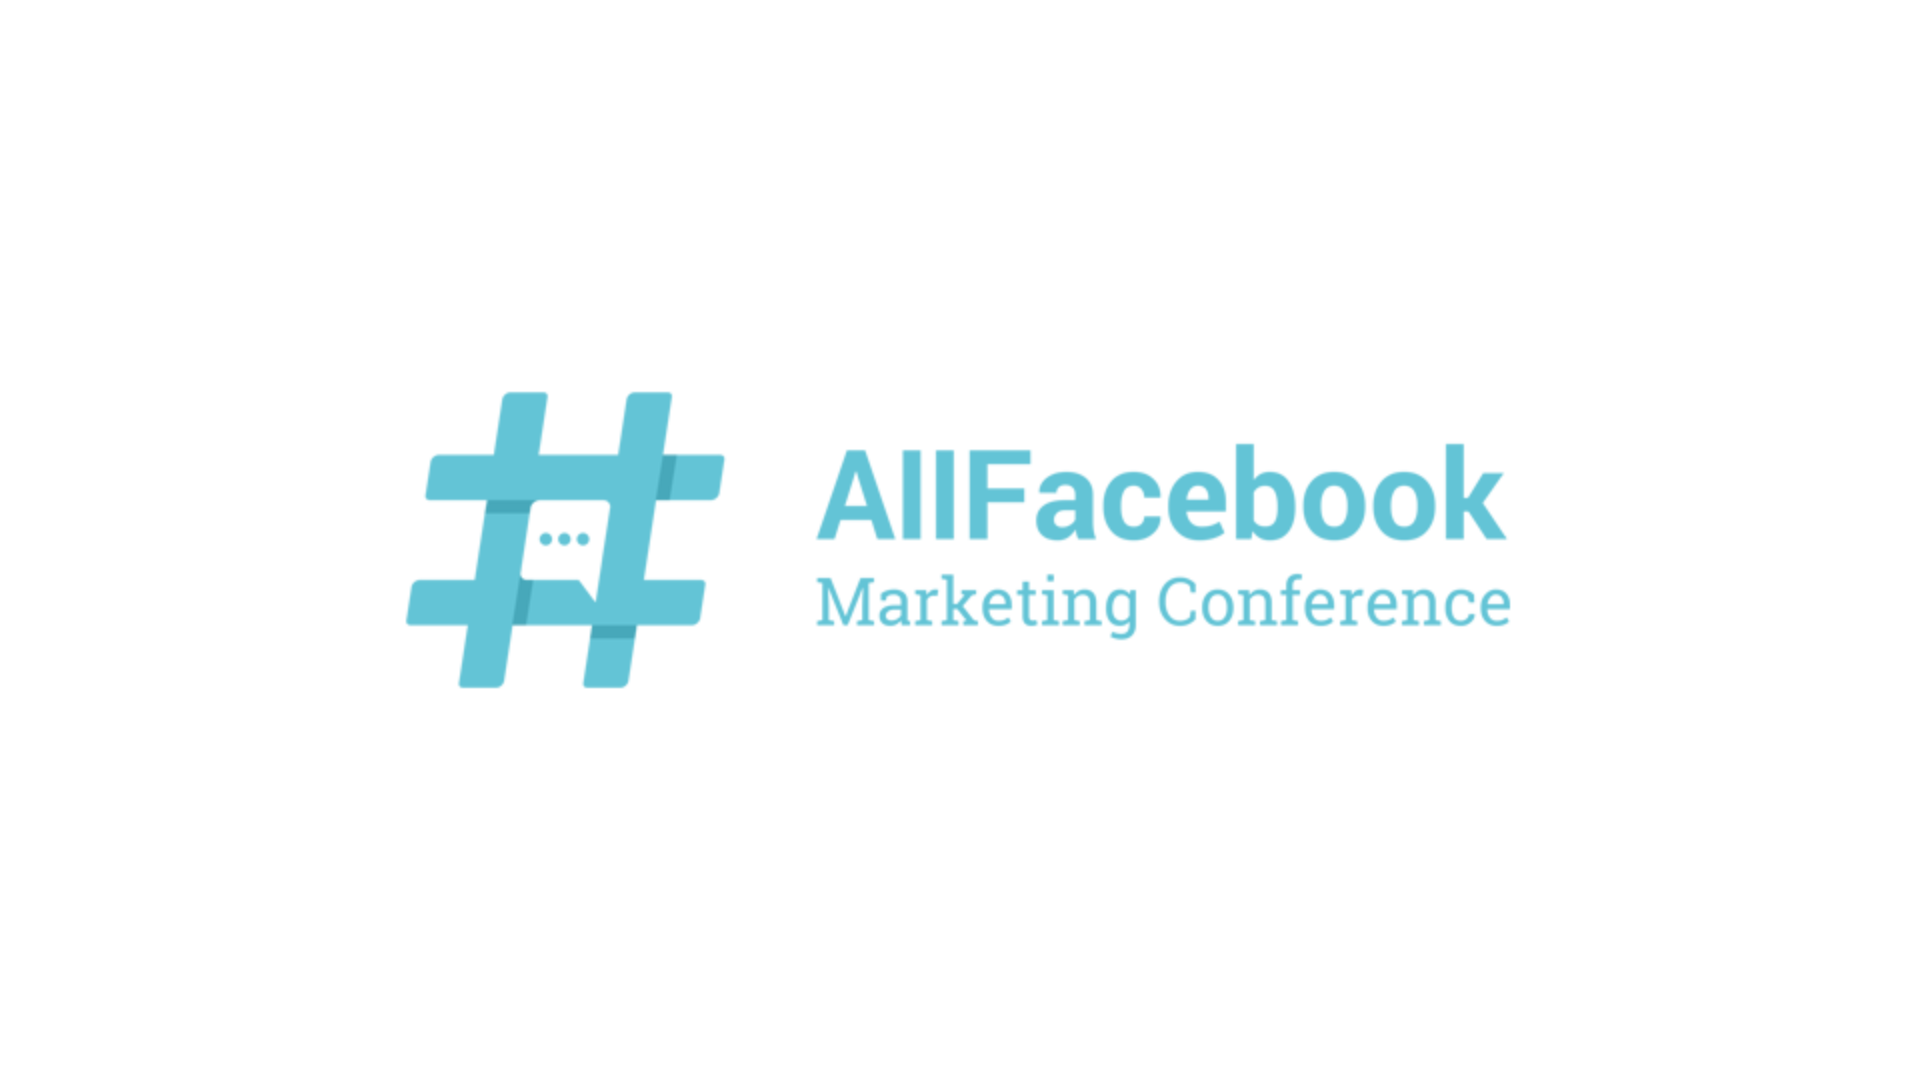 allfacebook logo messenger Veranstaltung Workshop